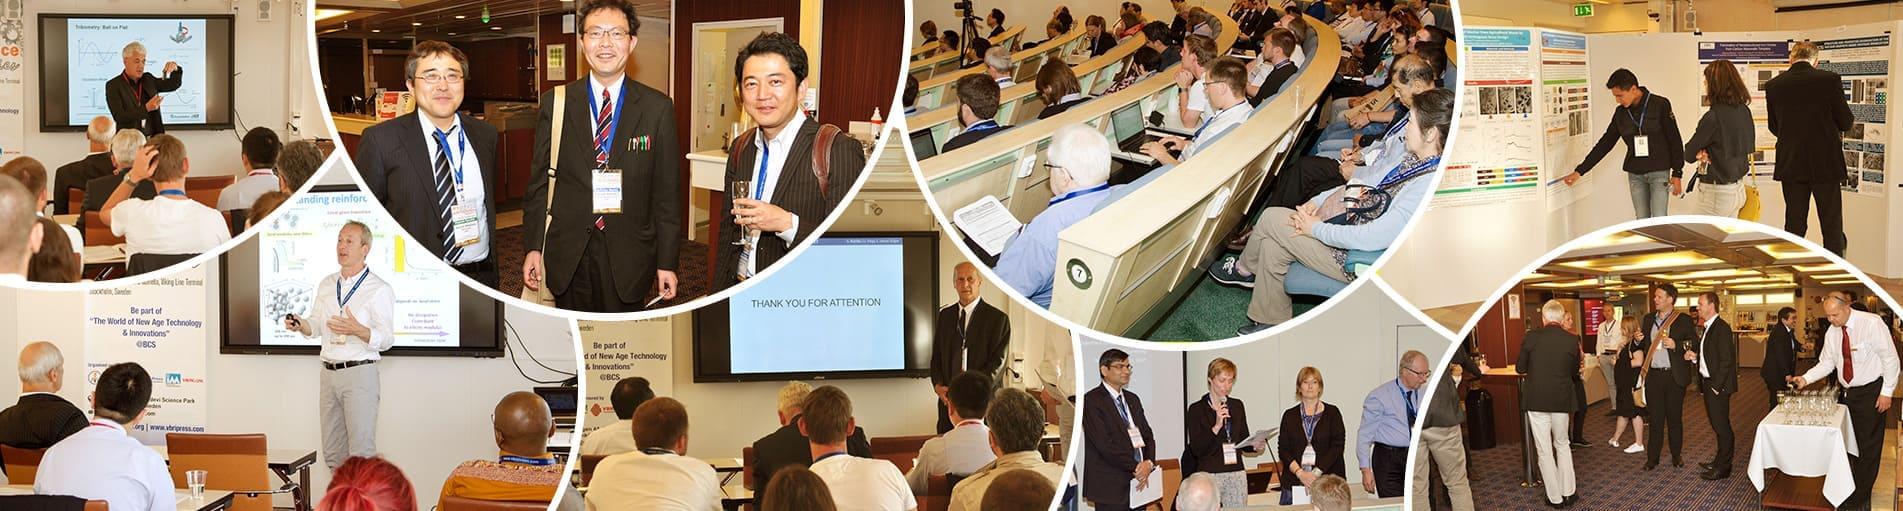 Social Activities at the Advanced Materials Congress